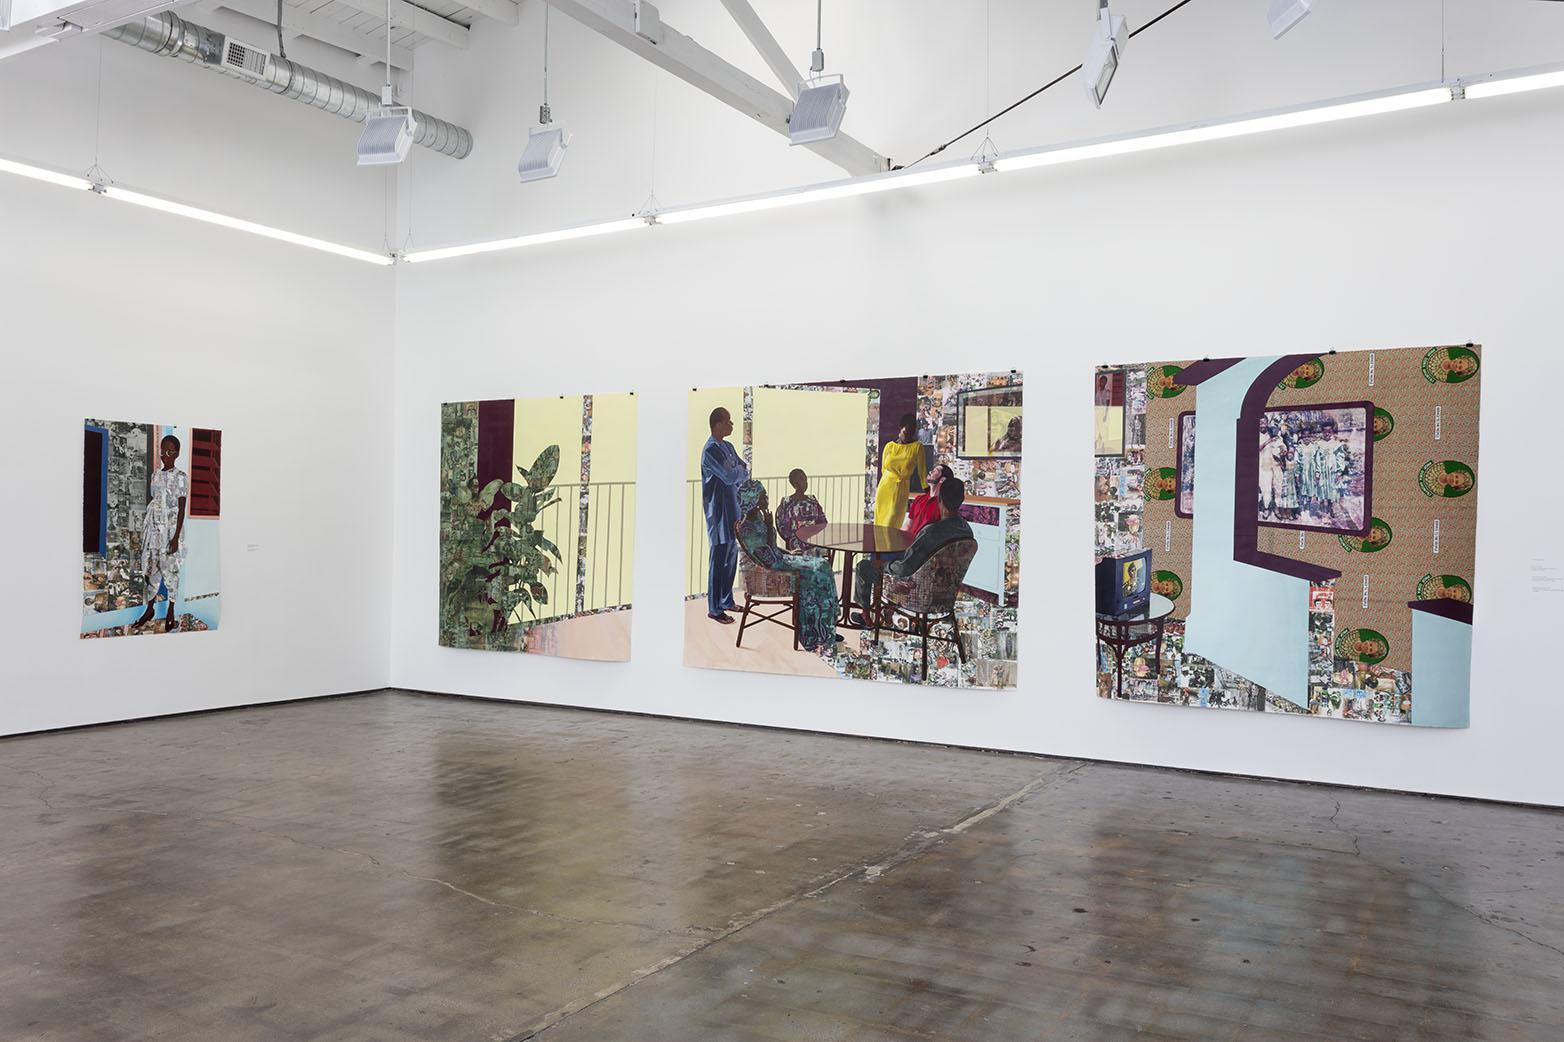 Njideka Akunyili Crosby: The Beautyful Ones and Two Films by Akosua Adoma Owusu at Art + Practice, Los Angeles. September 12 - November 21, 2015. Photo: Joshua White/JWPictures.com.